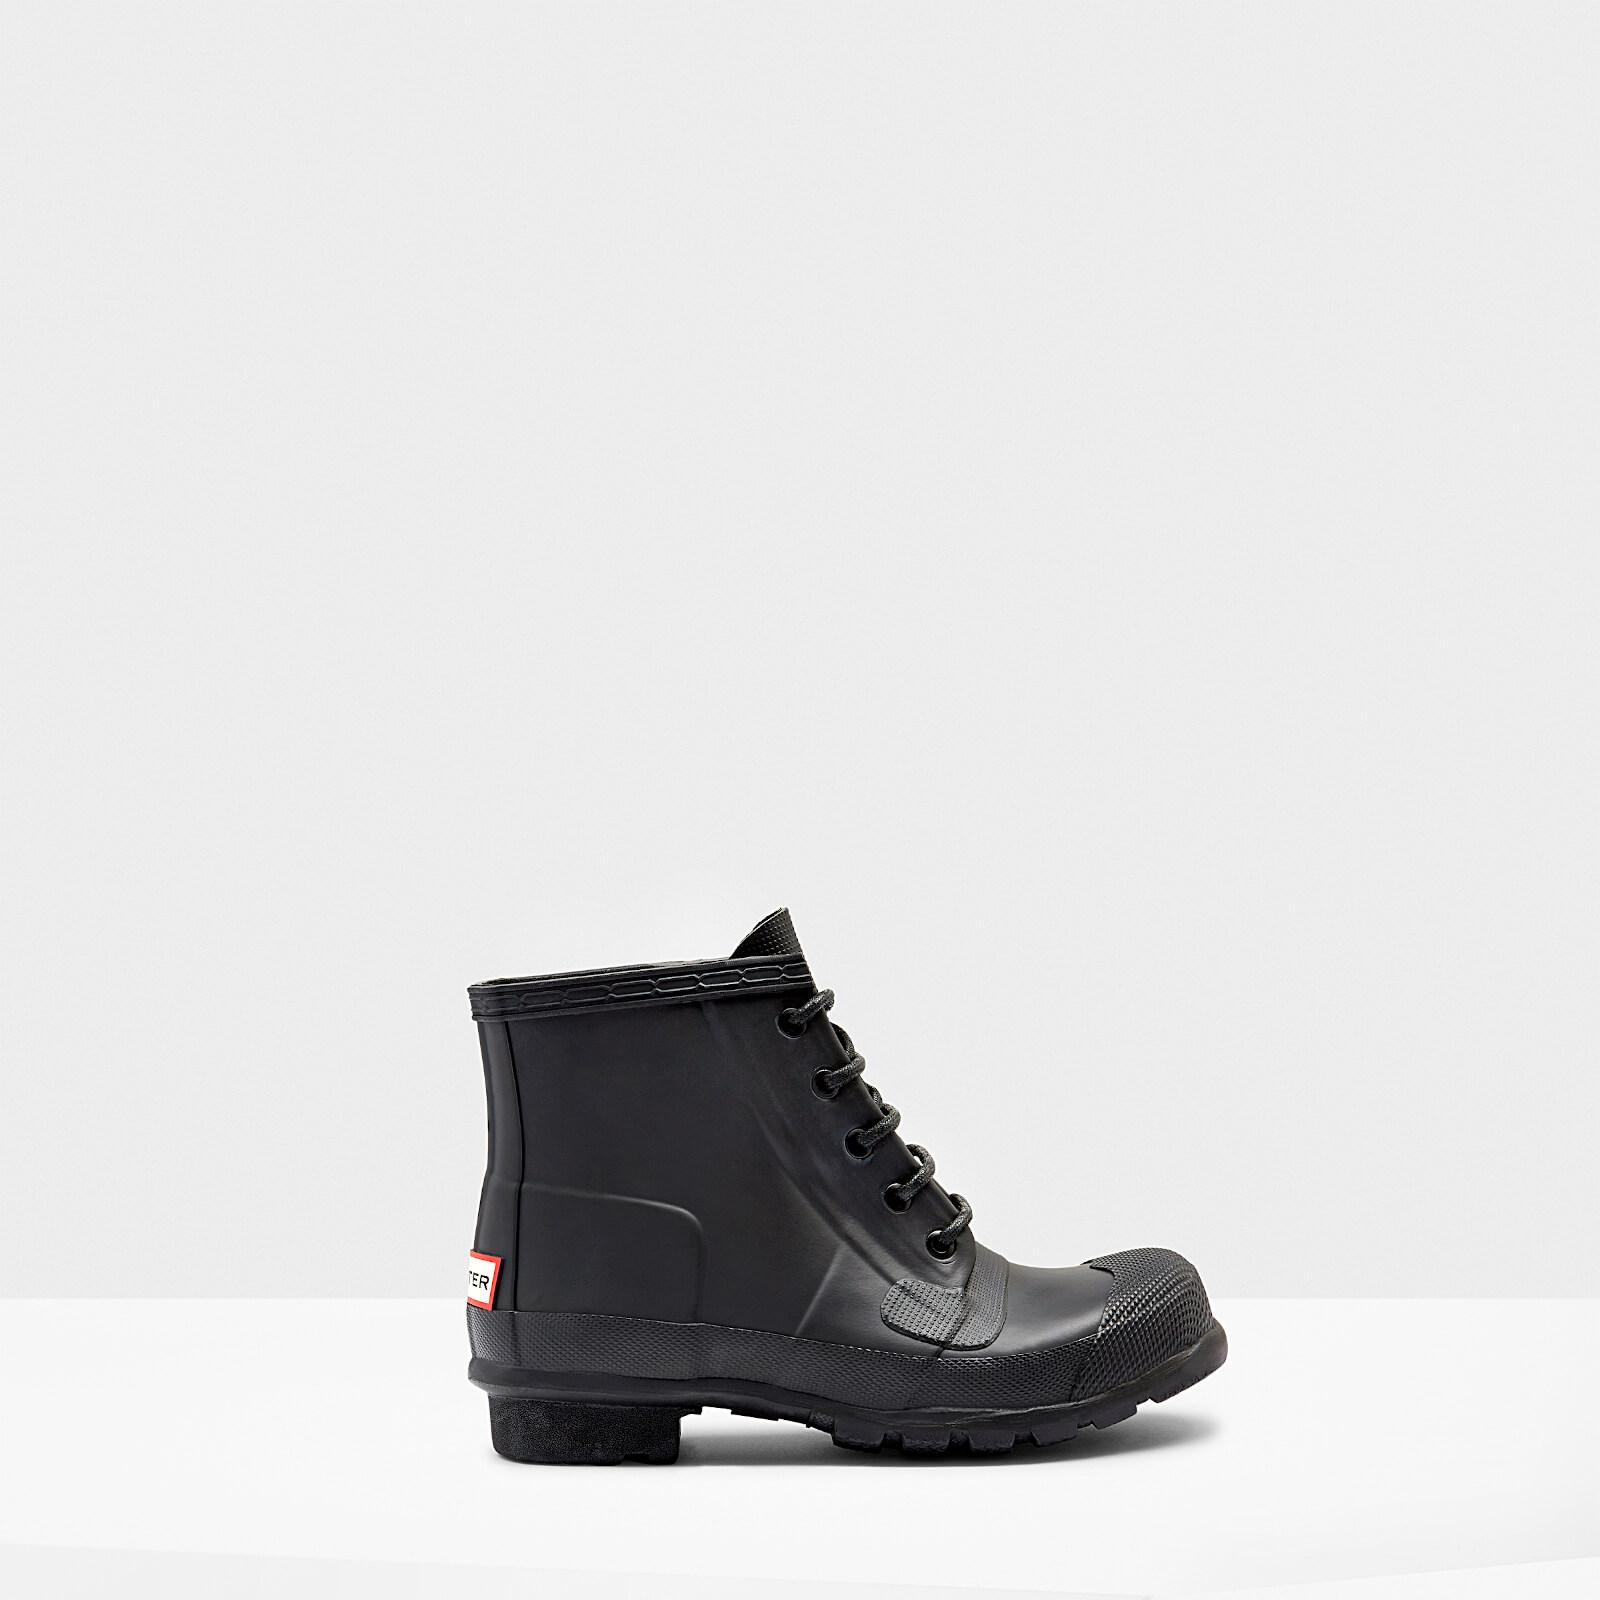 Women's Boots, Designer Footwear The Hut